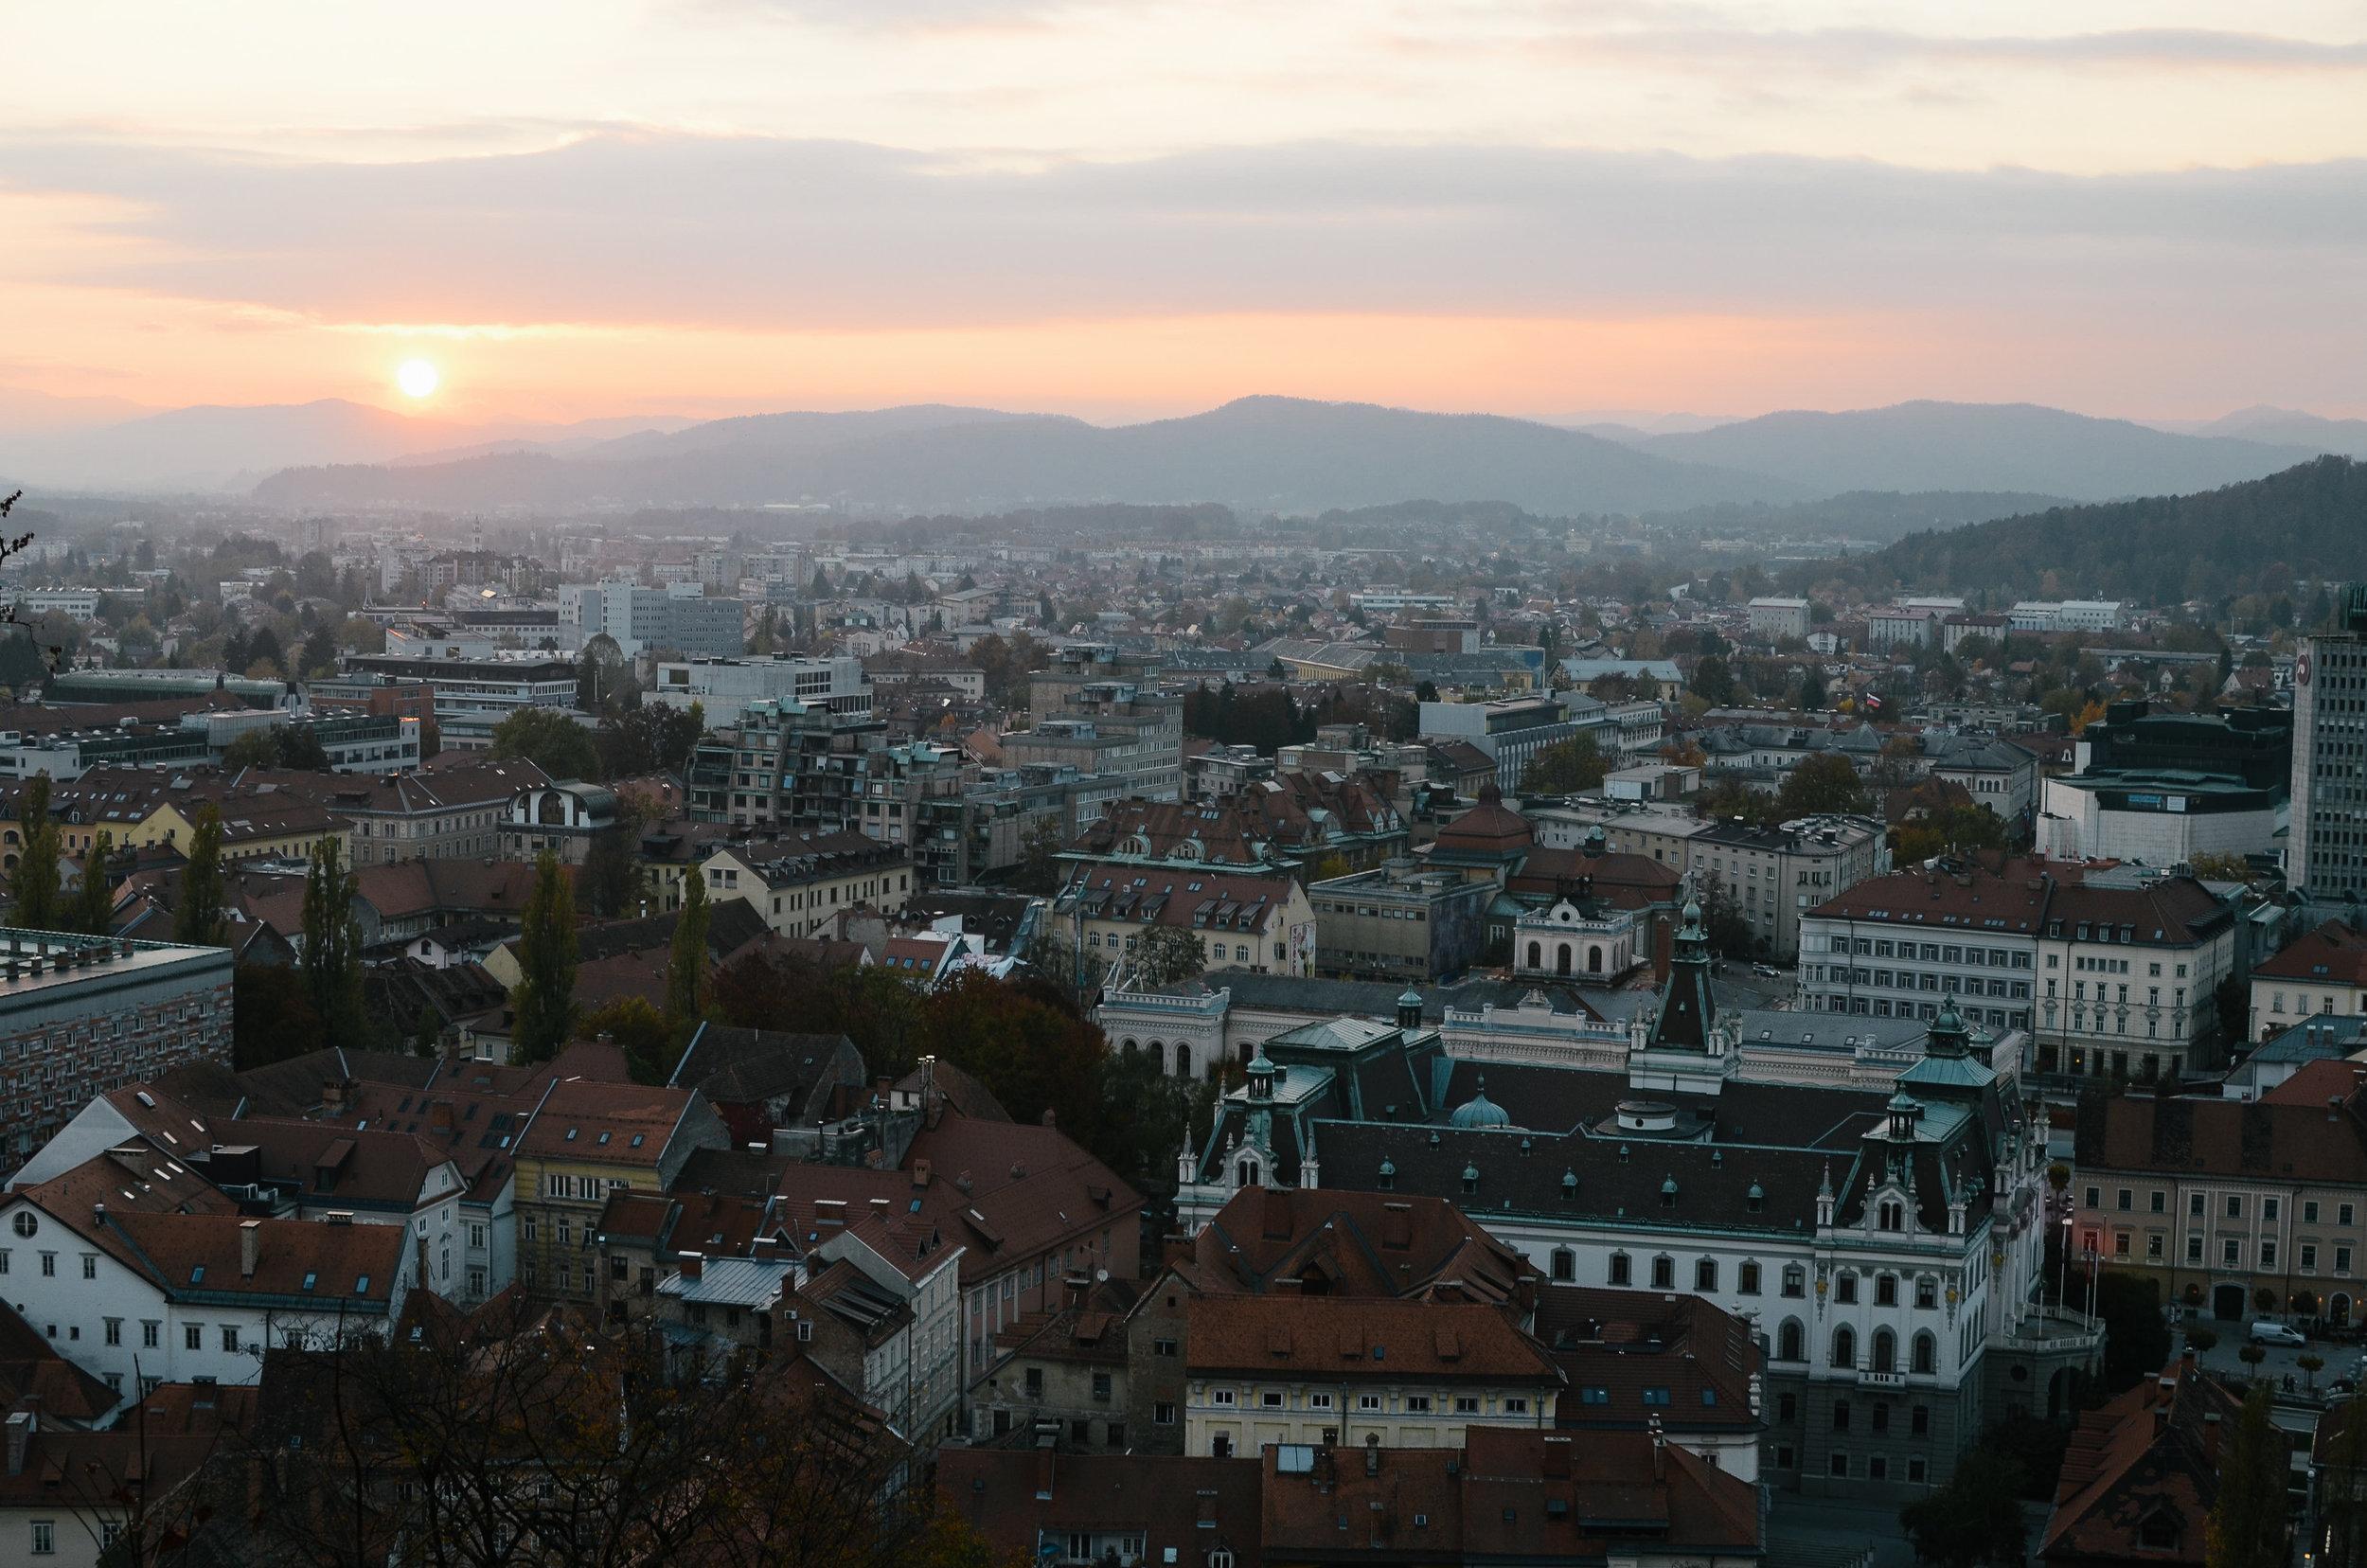 ljubljana-slovenia-travel-guide-lifeonpine_DSC_1986.jpg